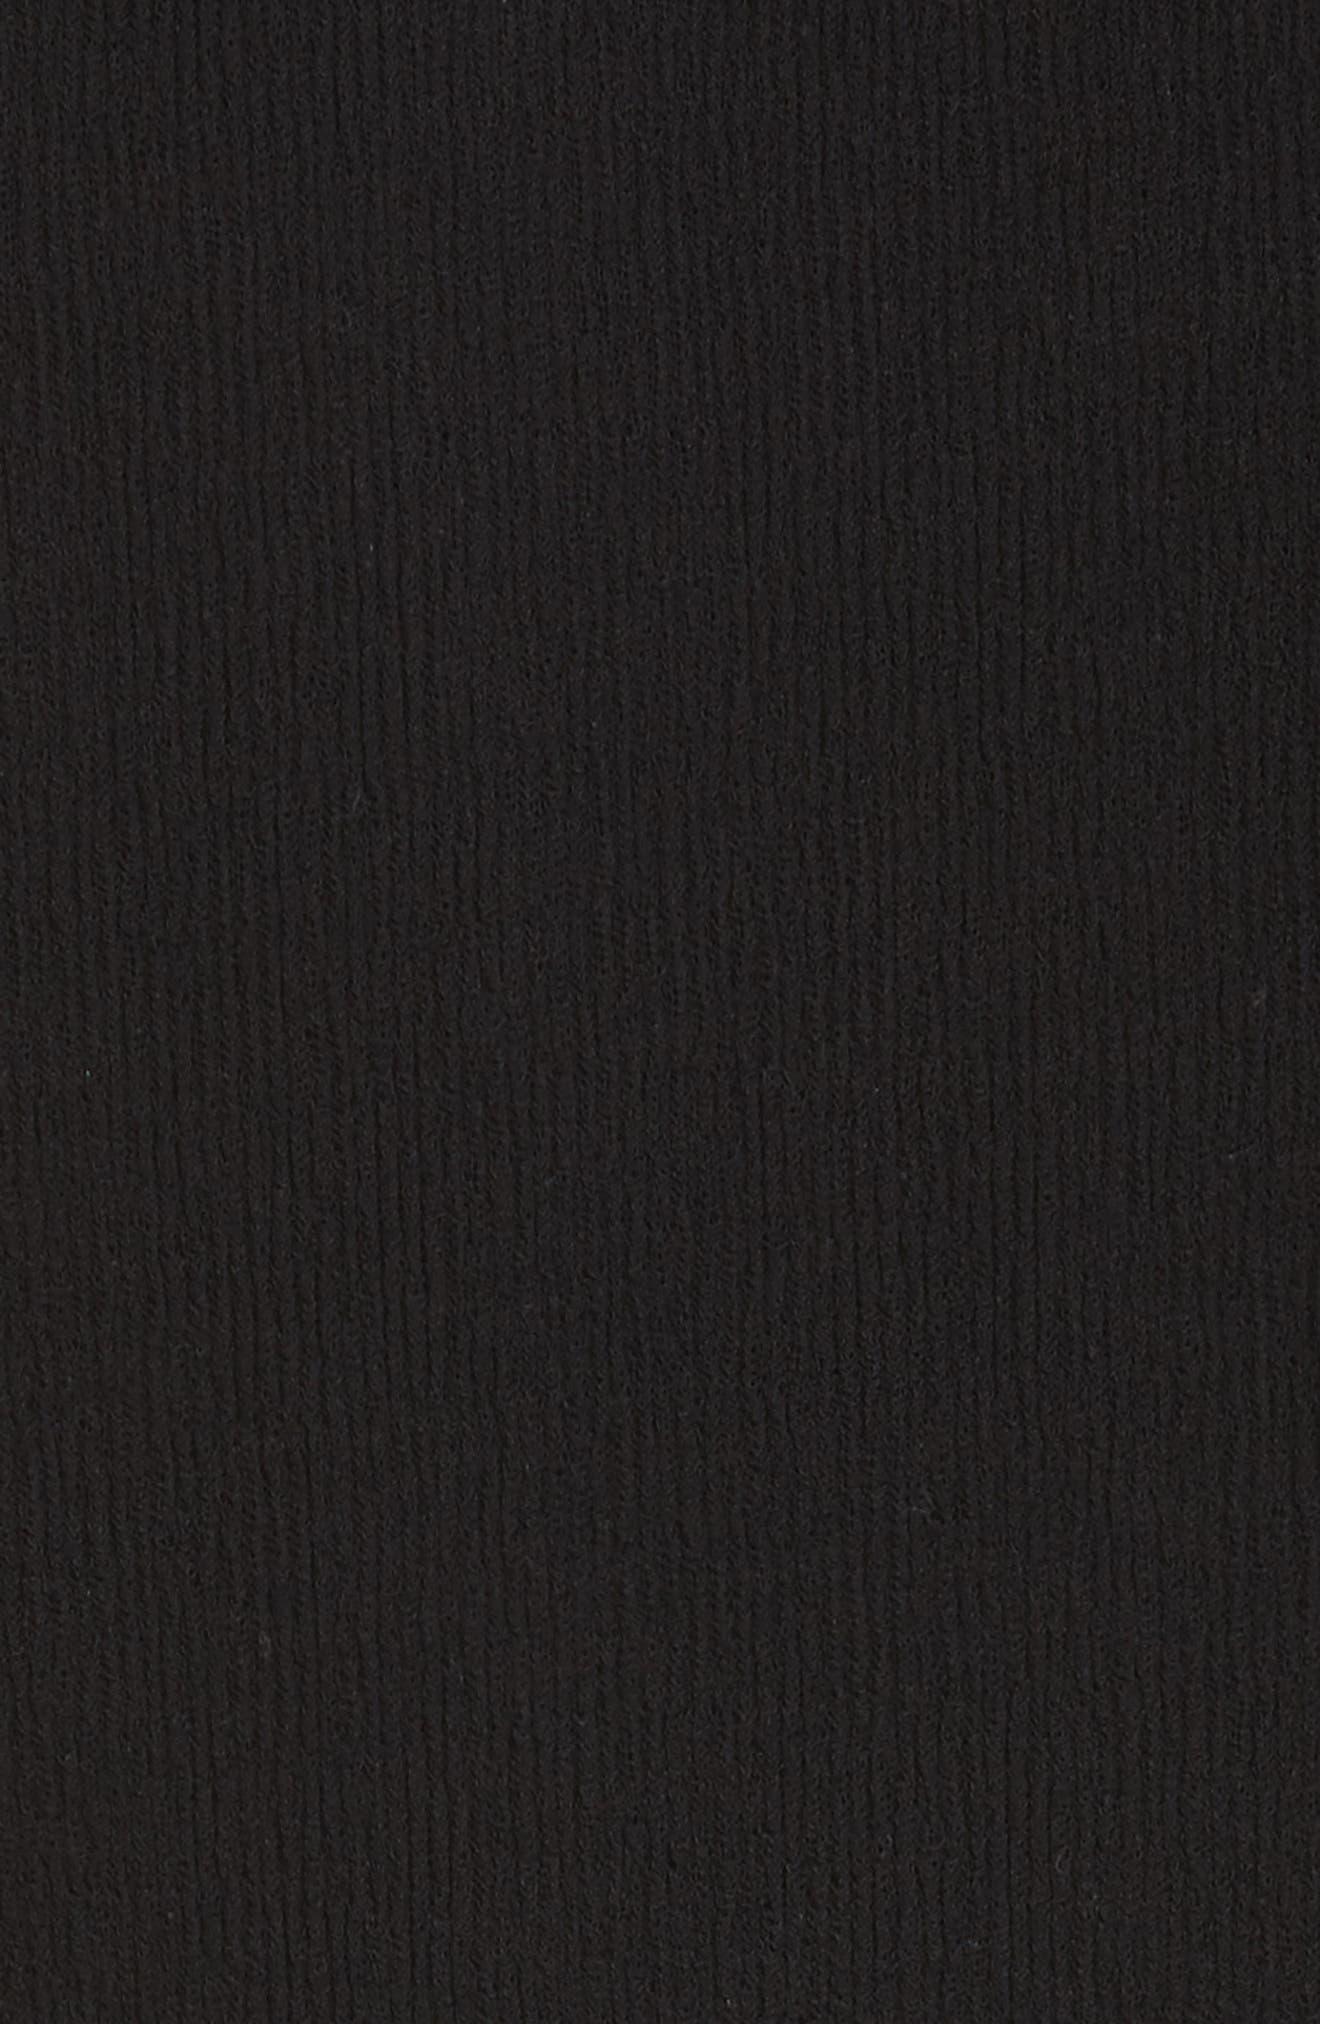 PSWL Illusion Jersey Gauze Top,                             Alternate thumbnail 6, color,                             001